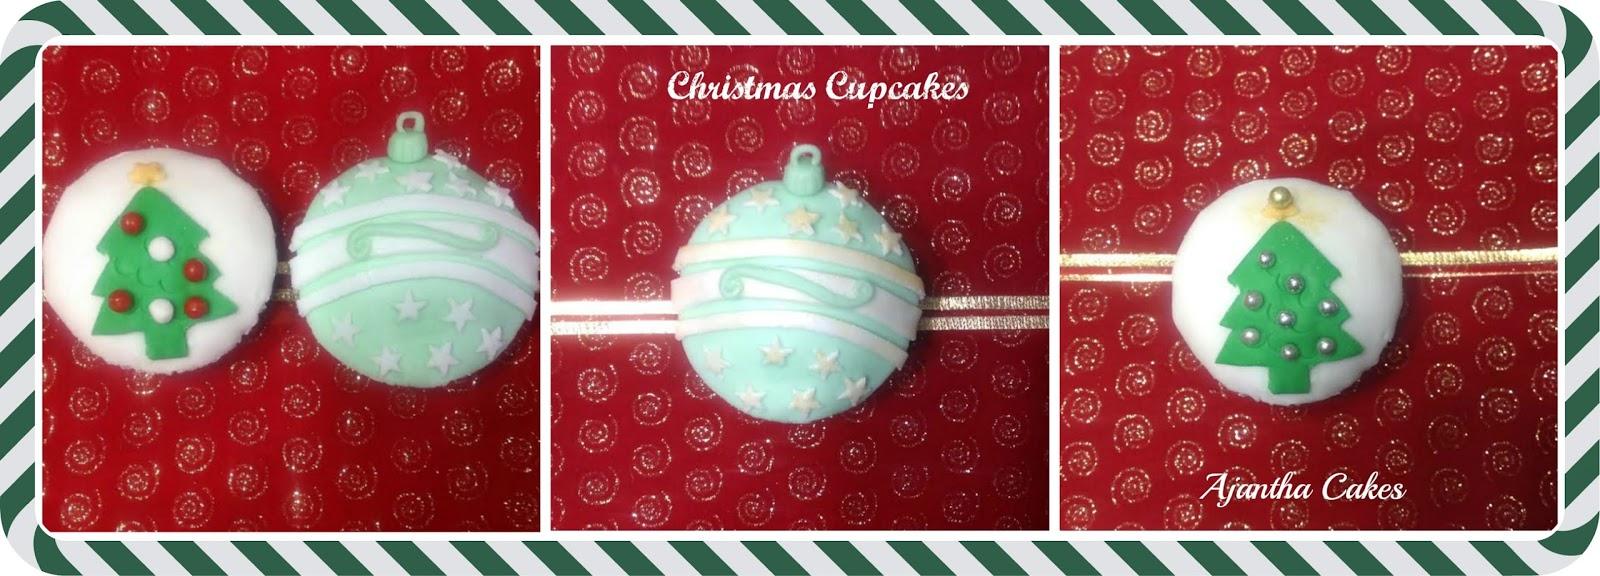 Ajantha Cakes, Christmas cupcakes 2014, Christmas Cakes